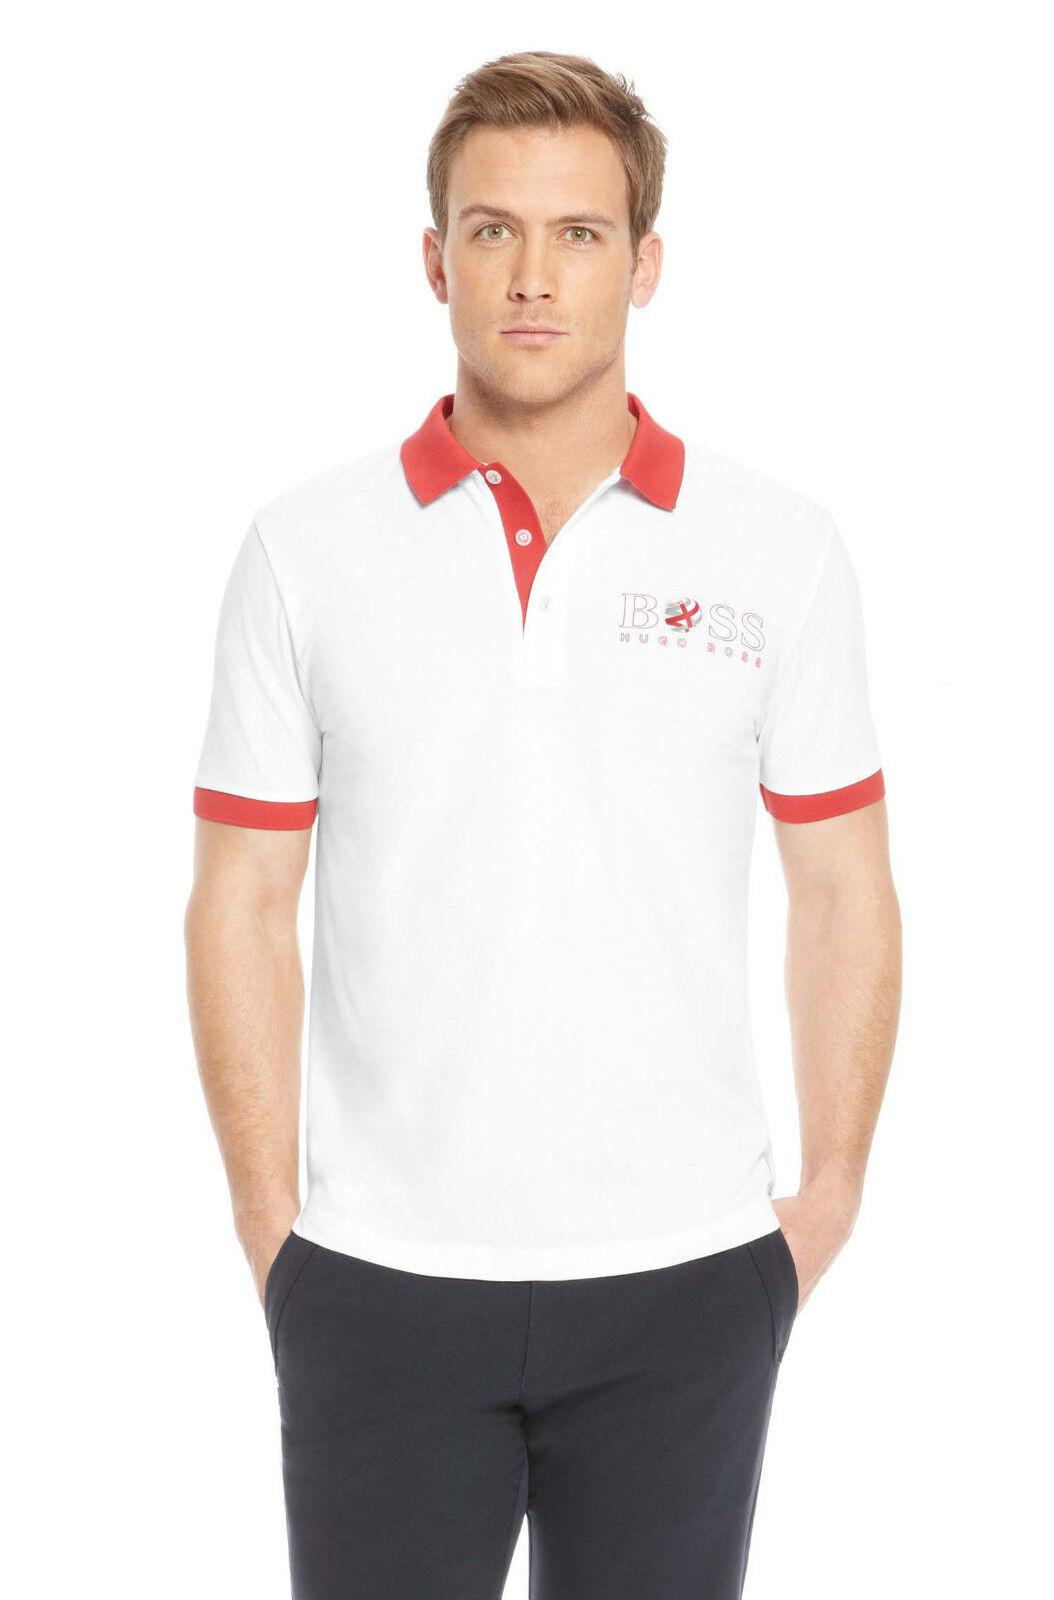 NEW HUGO BOSS WHITE ENGLAND FOOTBALL TEAM 3 LIONS PADDY PRO FLAG POLO T-SHIRT XL